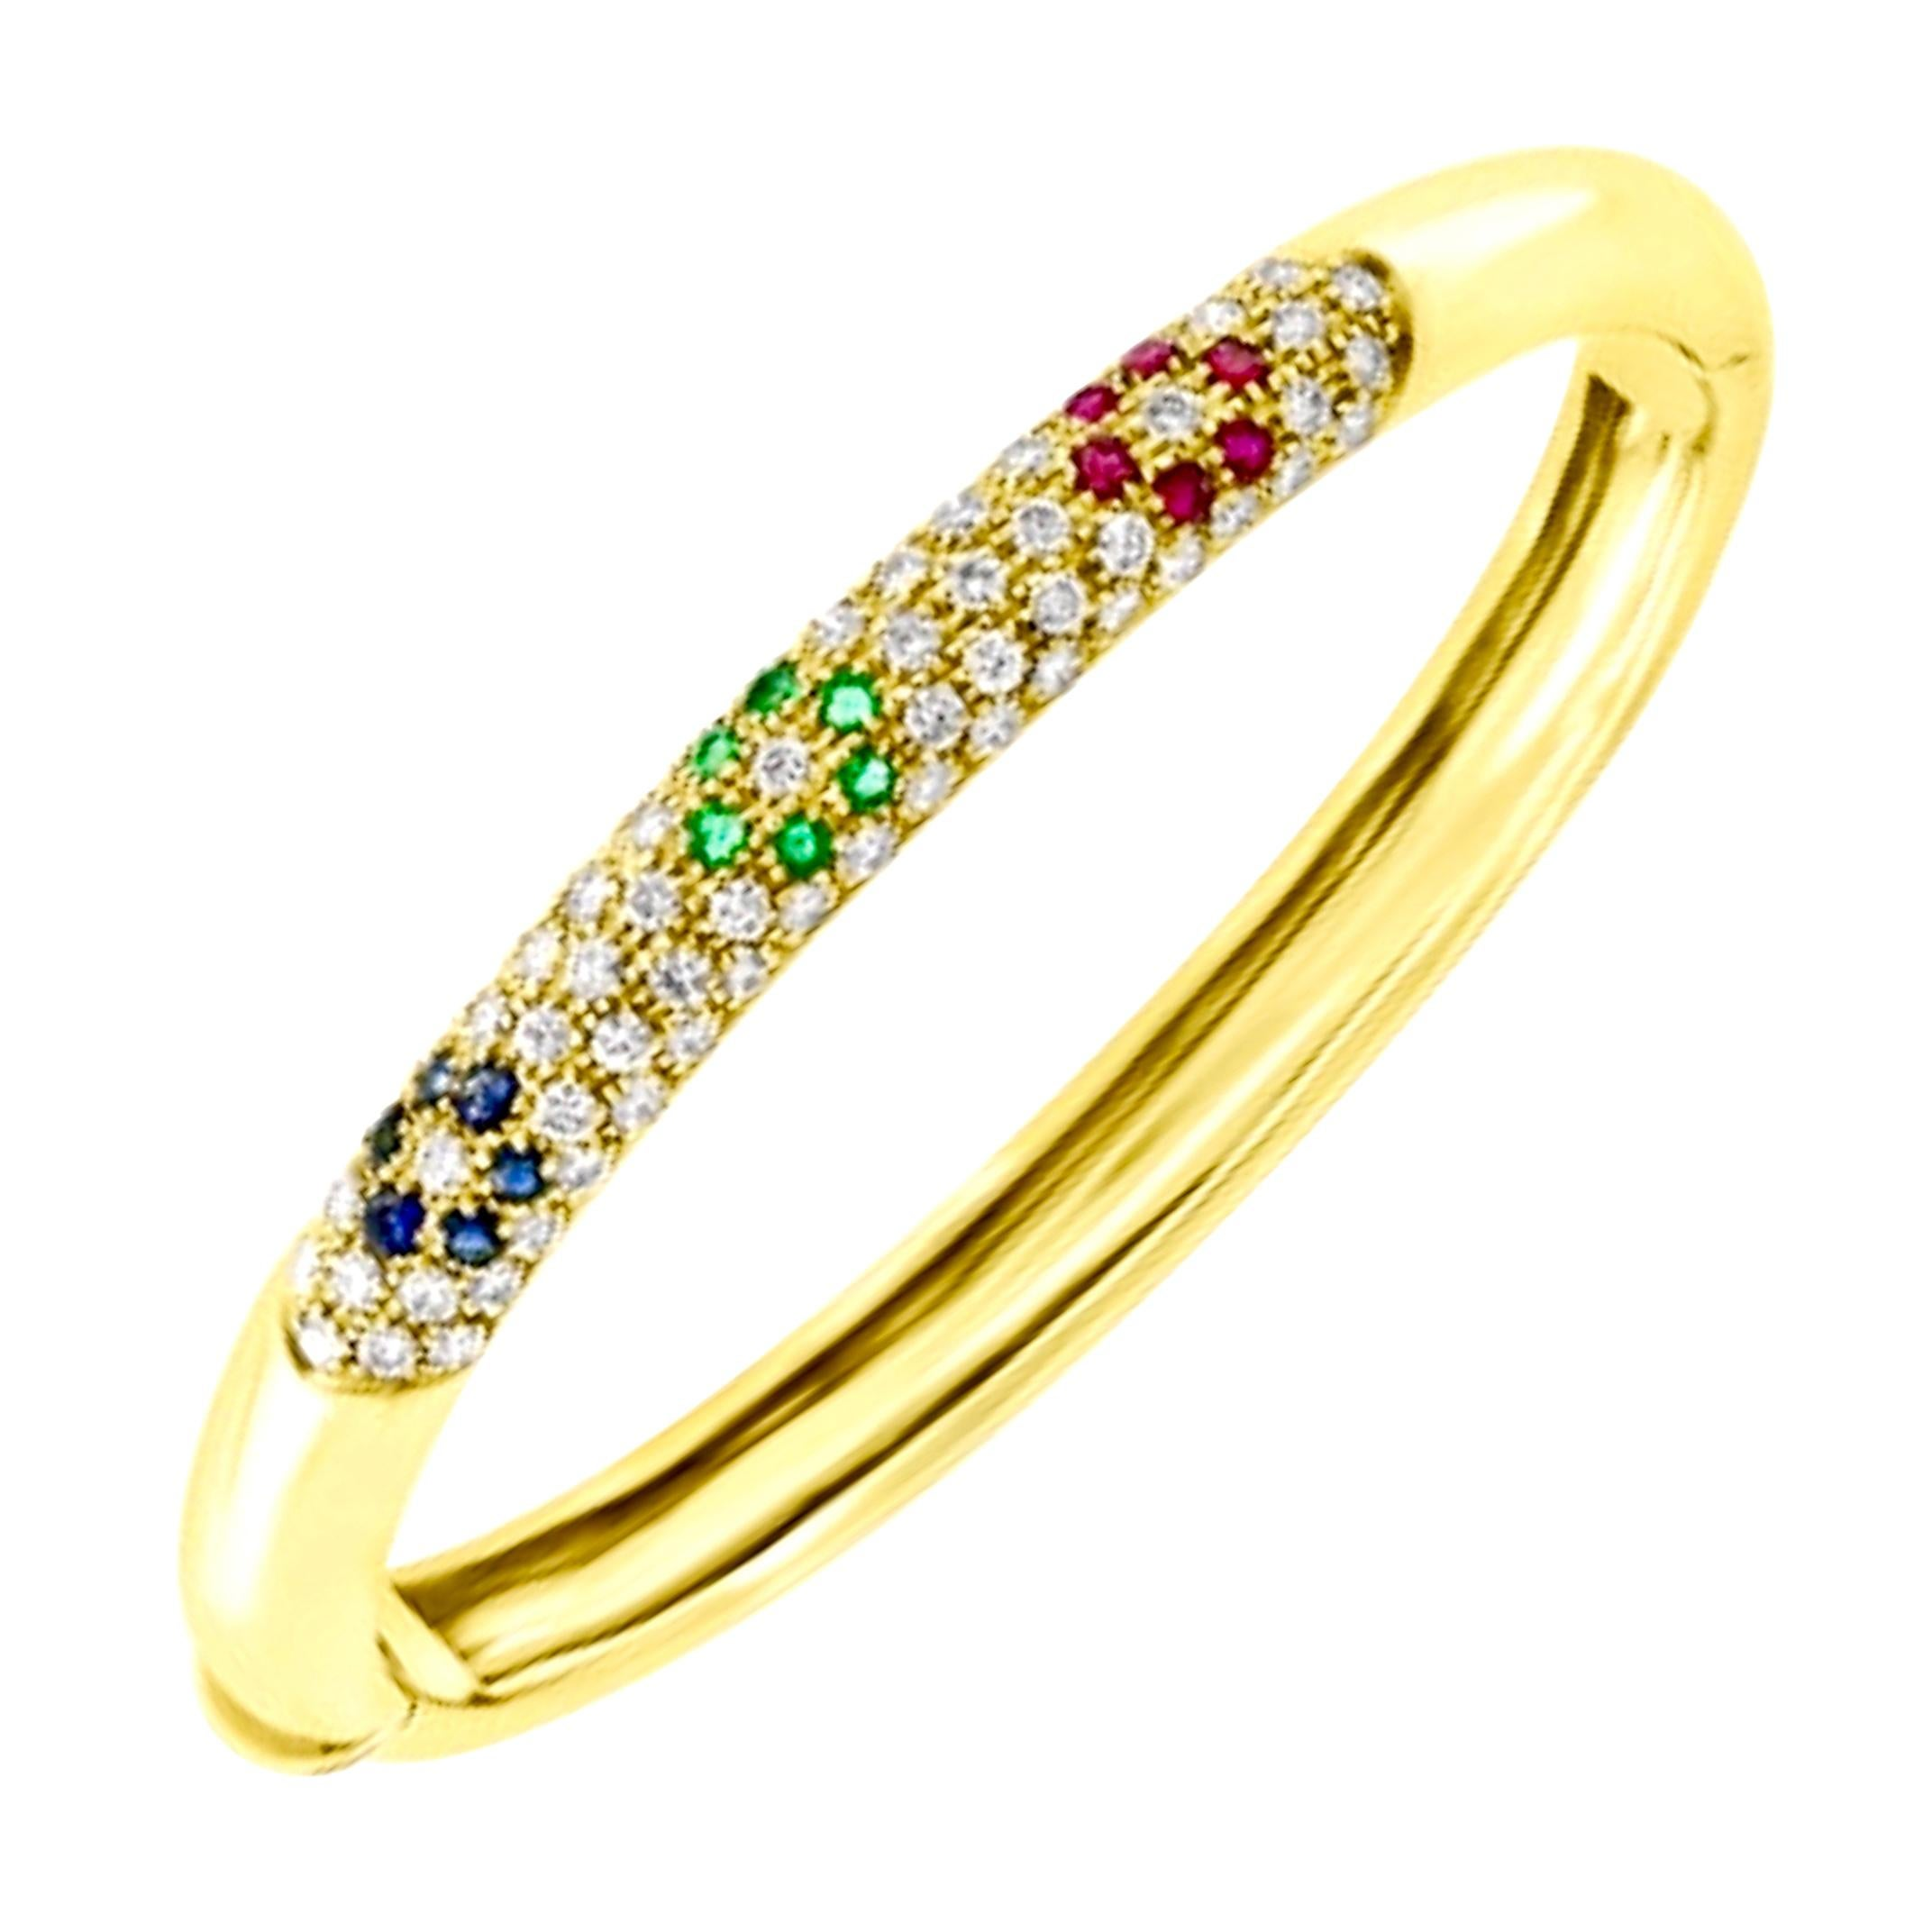 Emerald Ruby Sapphire and Diamond Cuff Bangle Bracelet in 18 Karat Yellow Gold